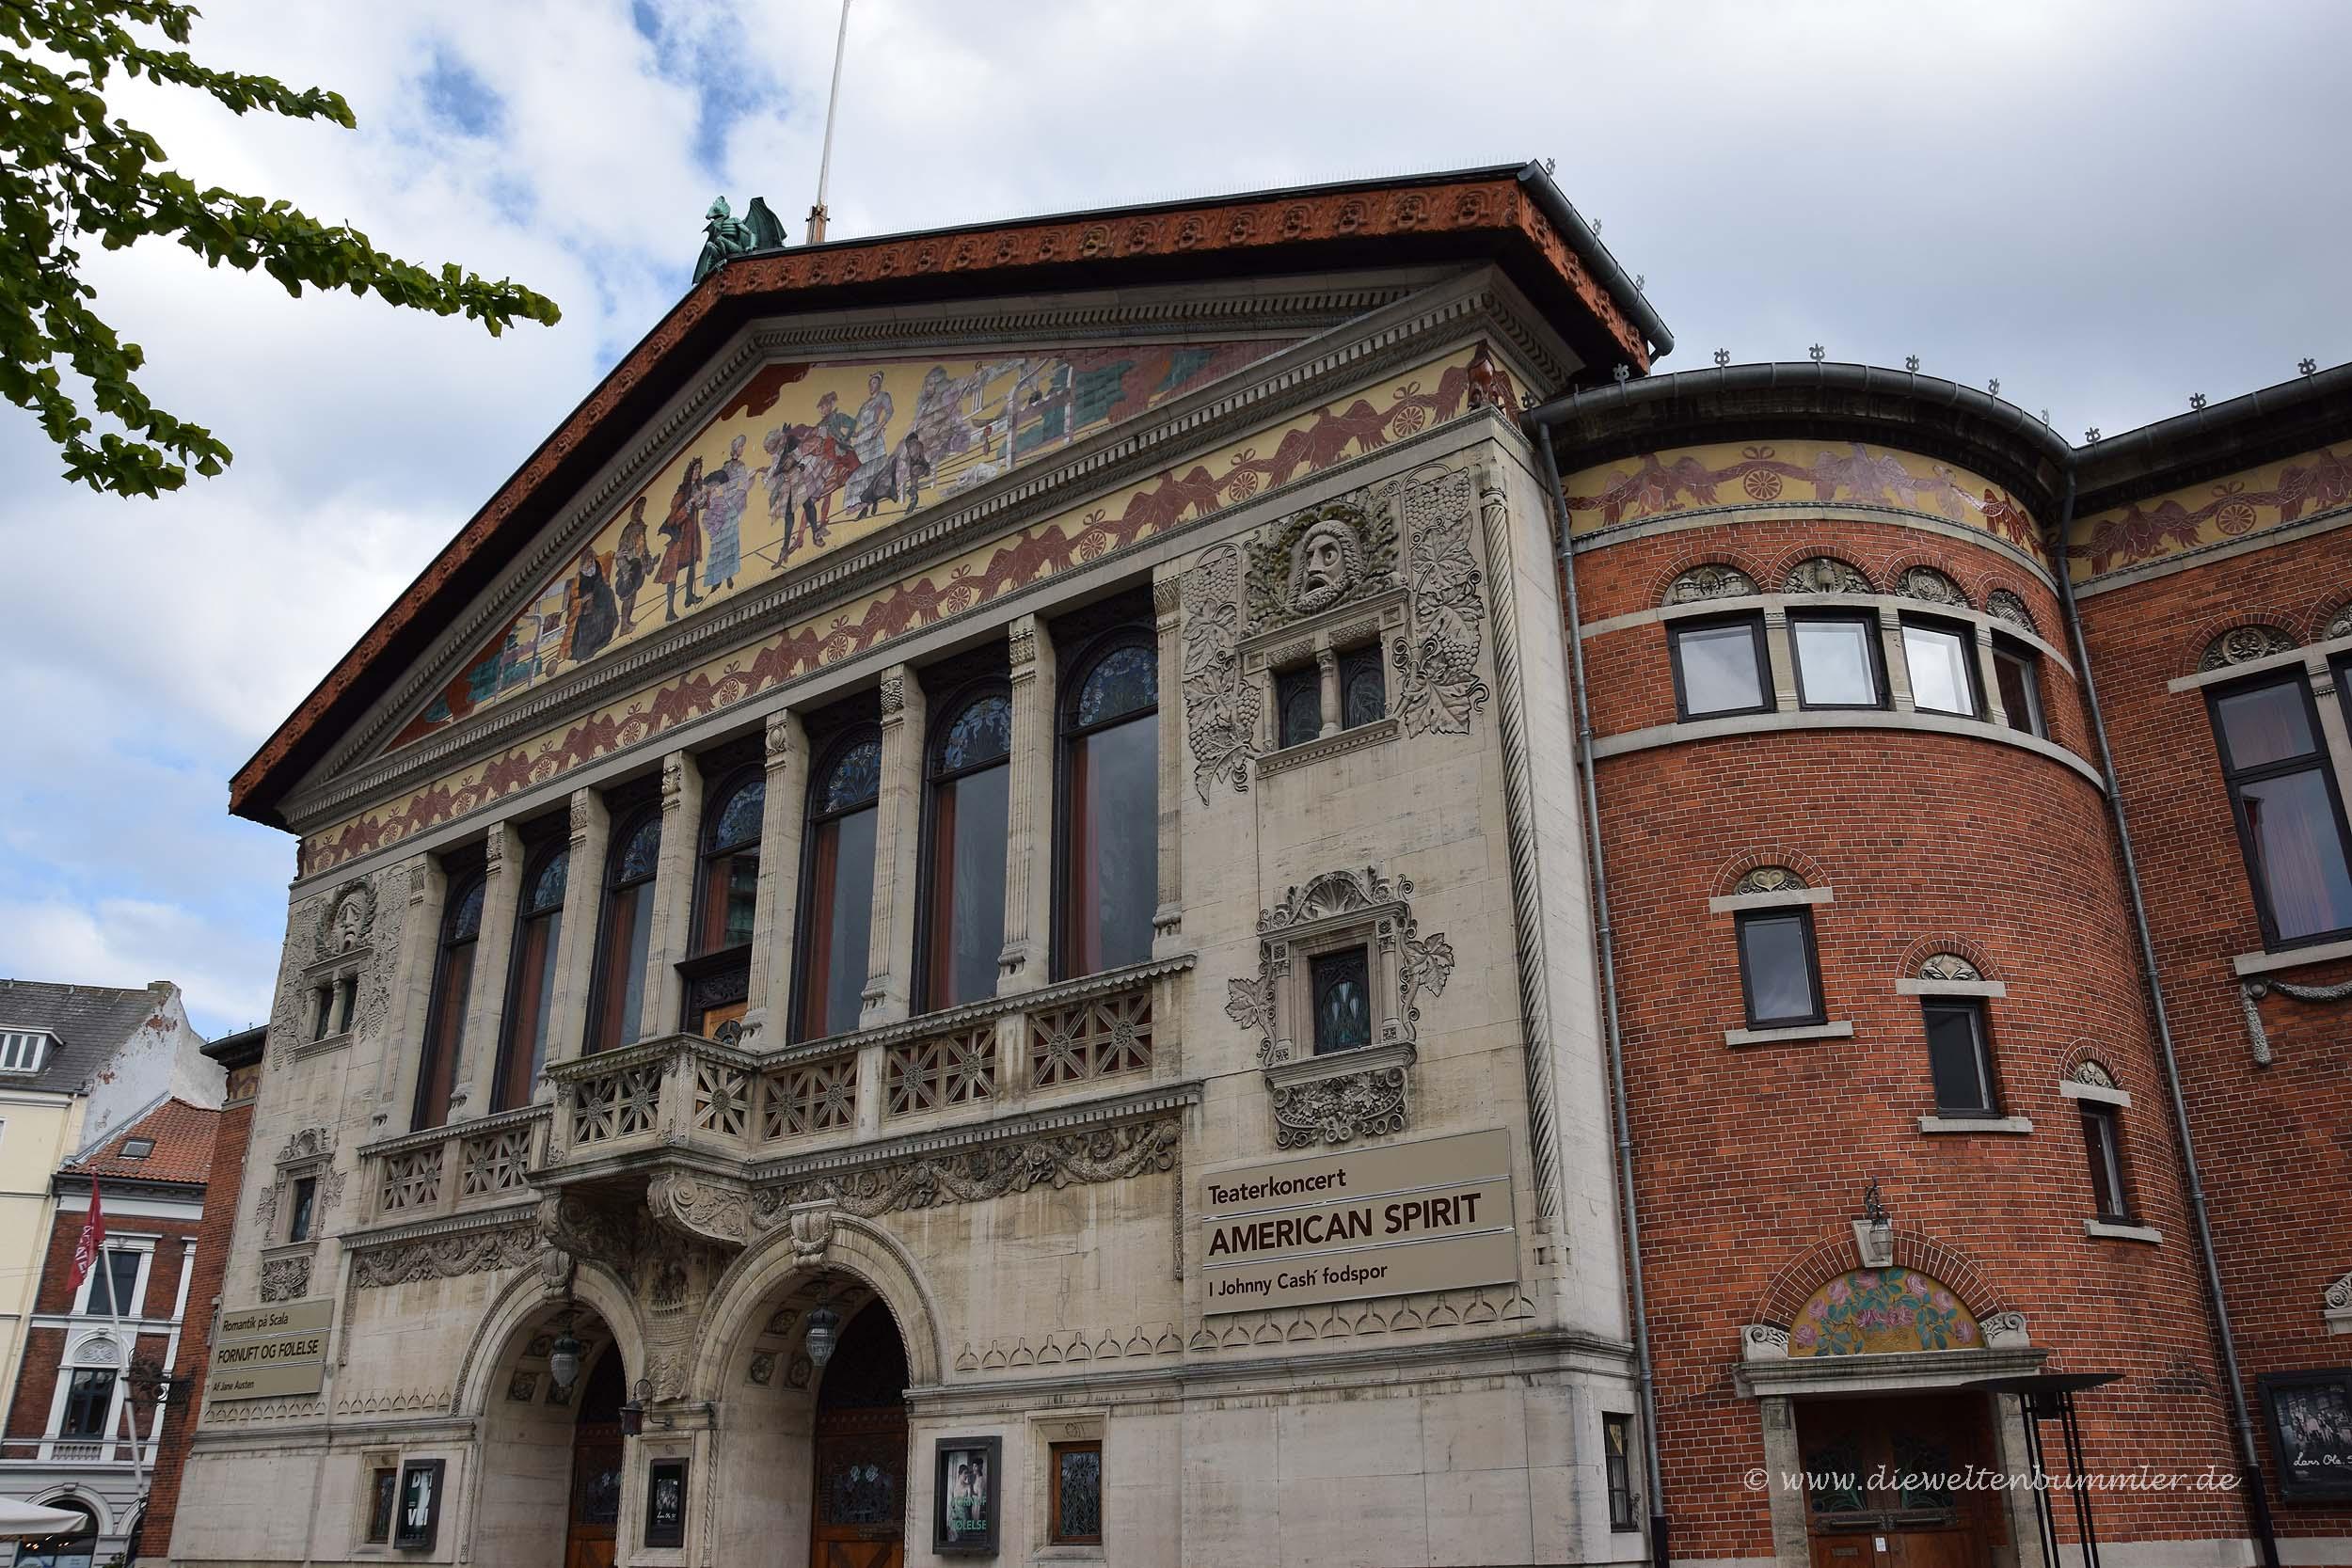 Theater von Aarhus